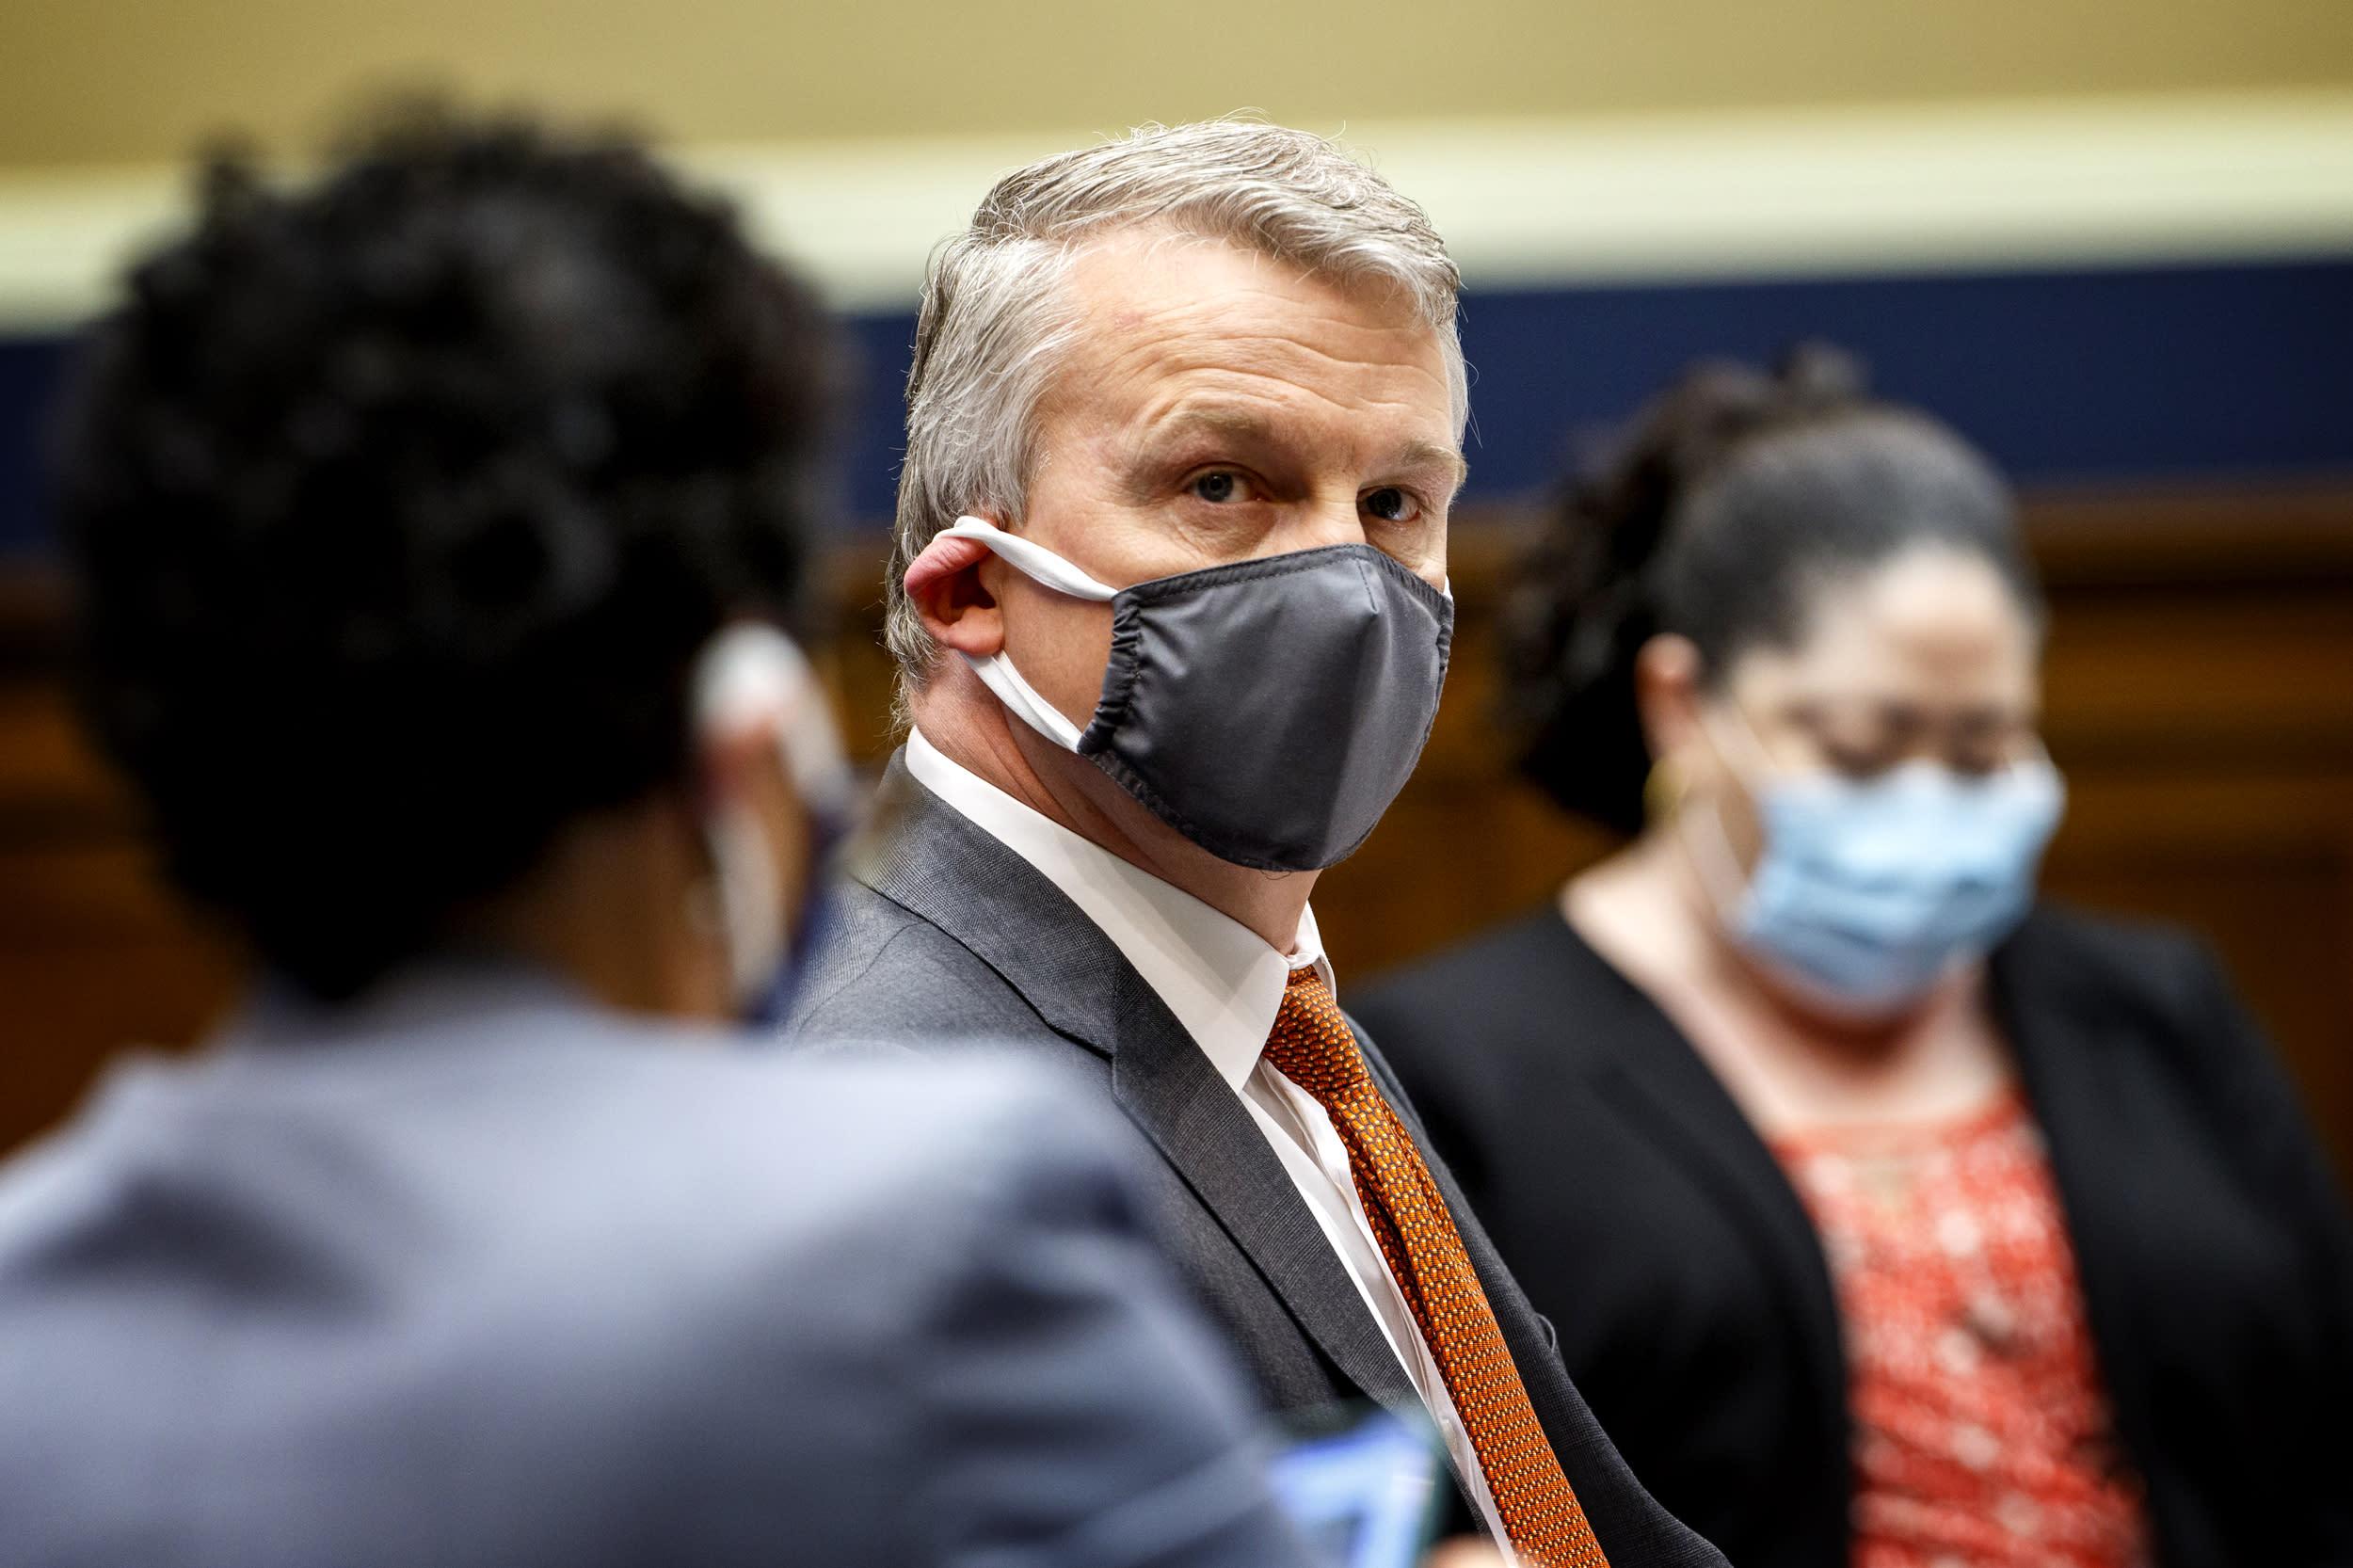 Whistleblower Rick Bright says Trump admin's virus approach is 'dangerous'